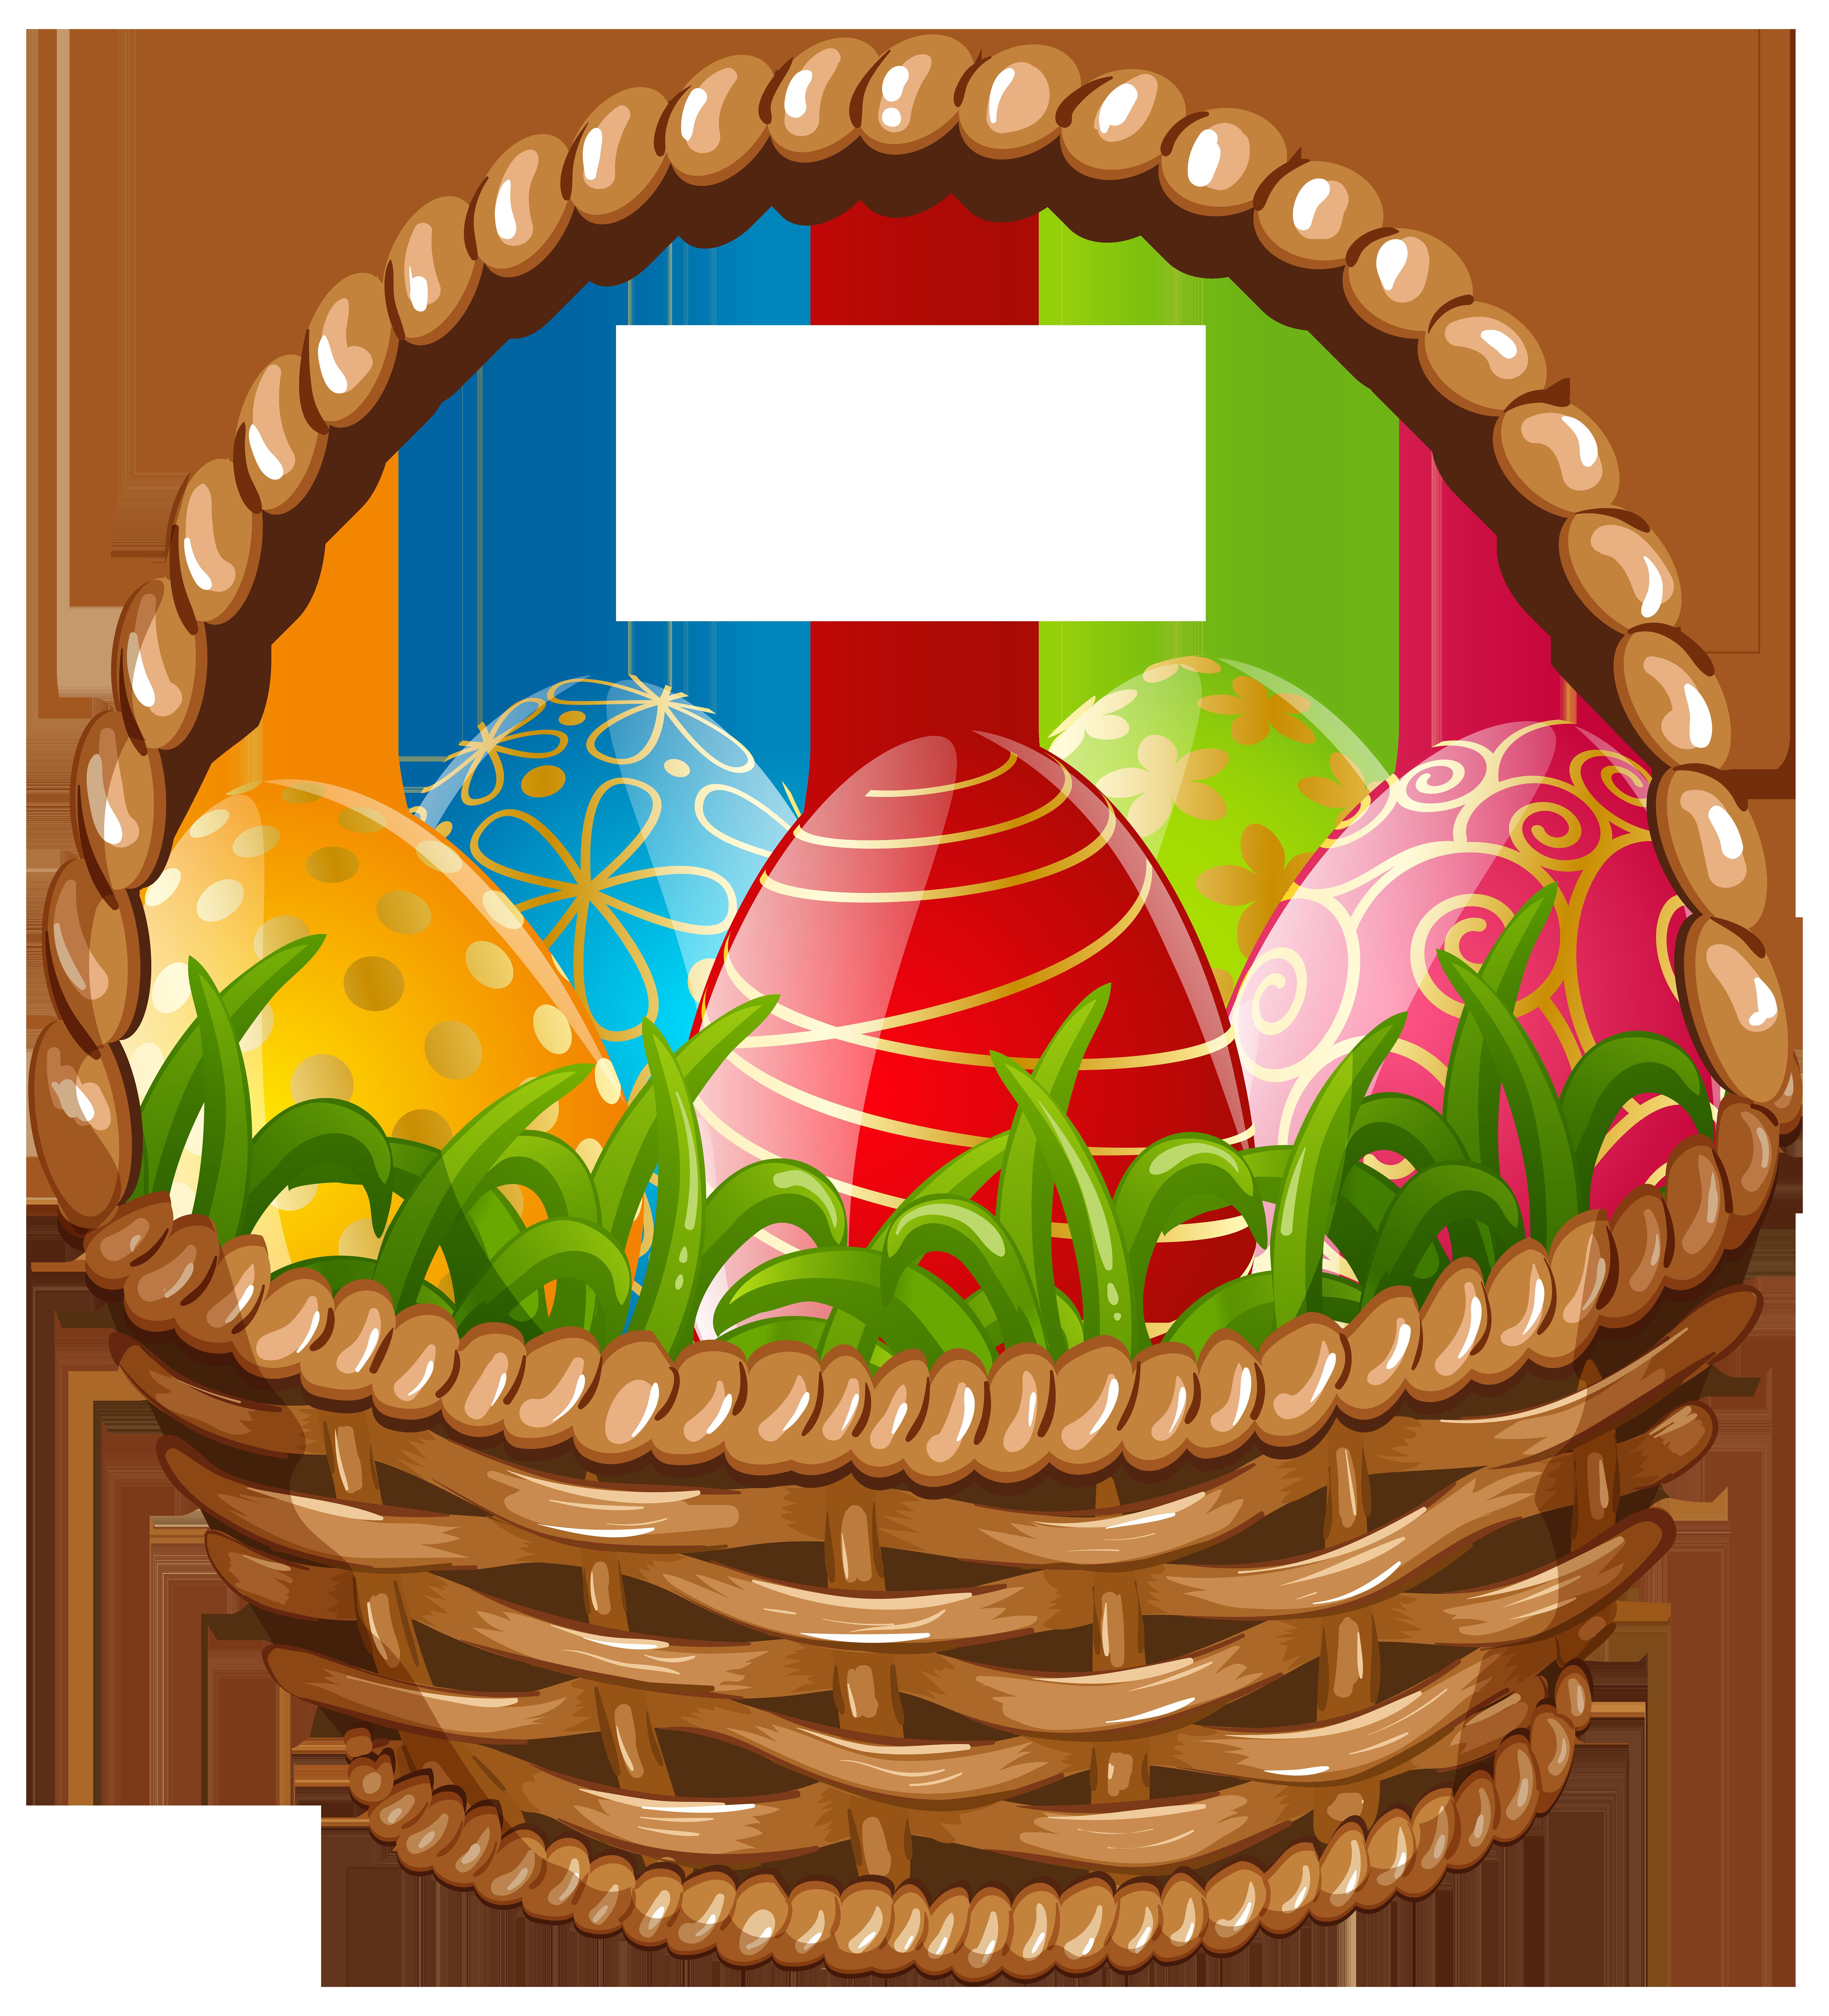 6351x7000 Easter Egg Basket Png Clip Art Imageu200b Gallery Yopriceville